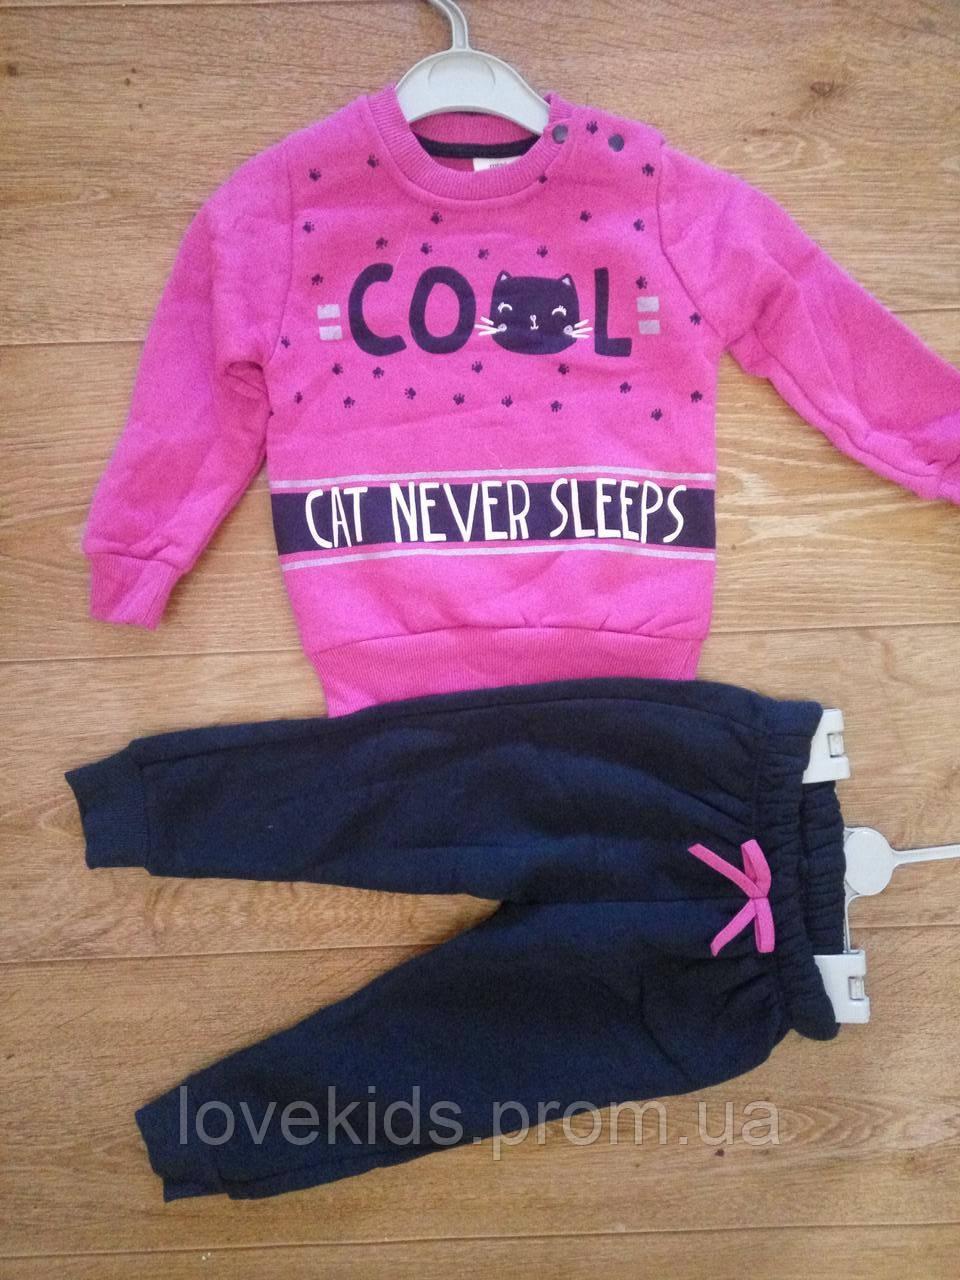 8e071b6b Спортивный костюм для девочки 1 год (начес) - Интернет-магазин